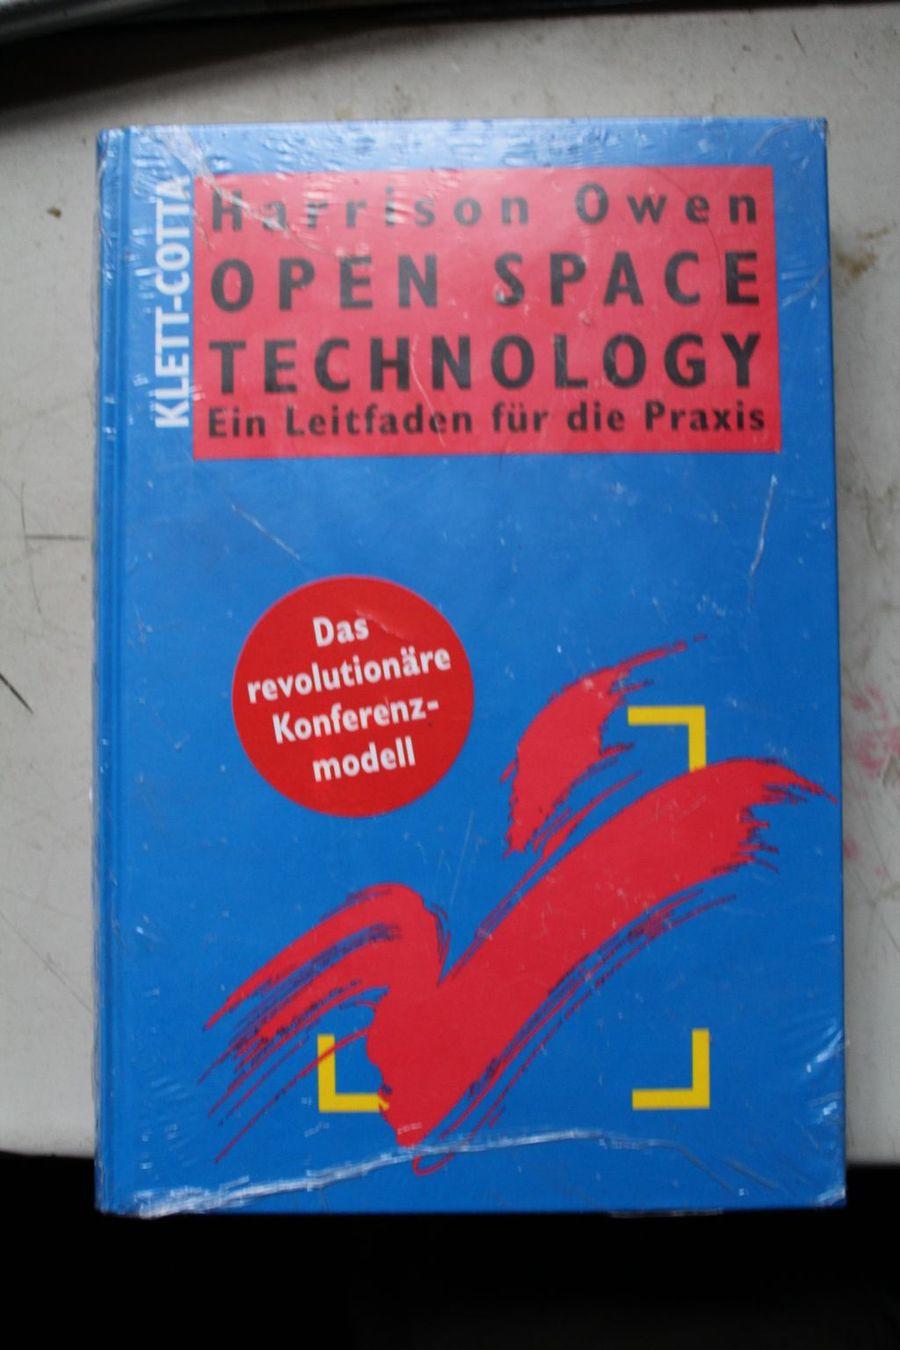 Harrison Owen  Open Space Technology     Ein       Leitfaden    f  r